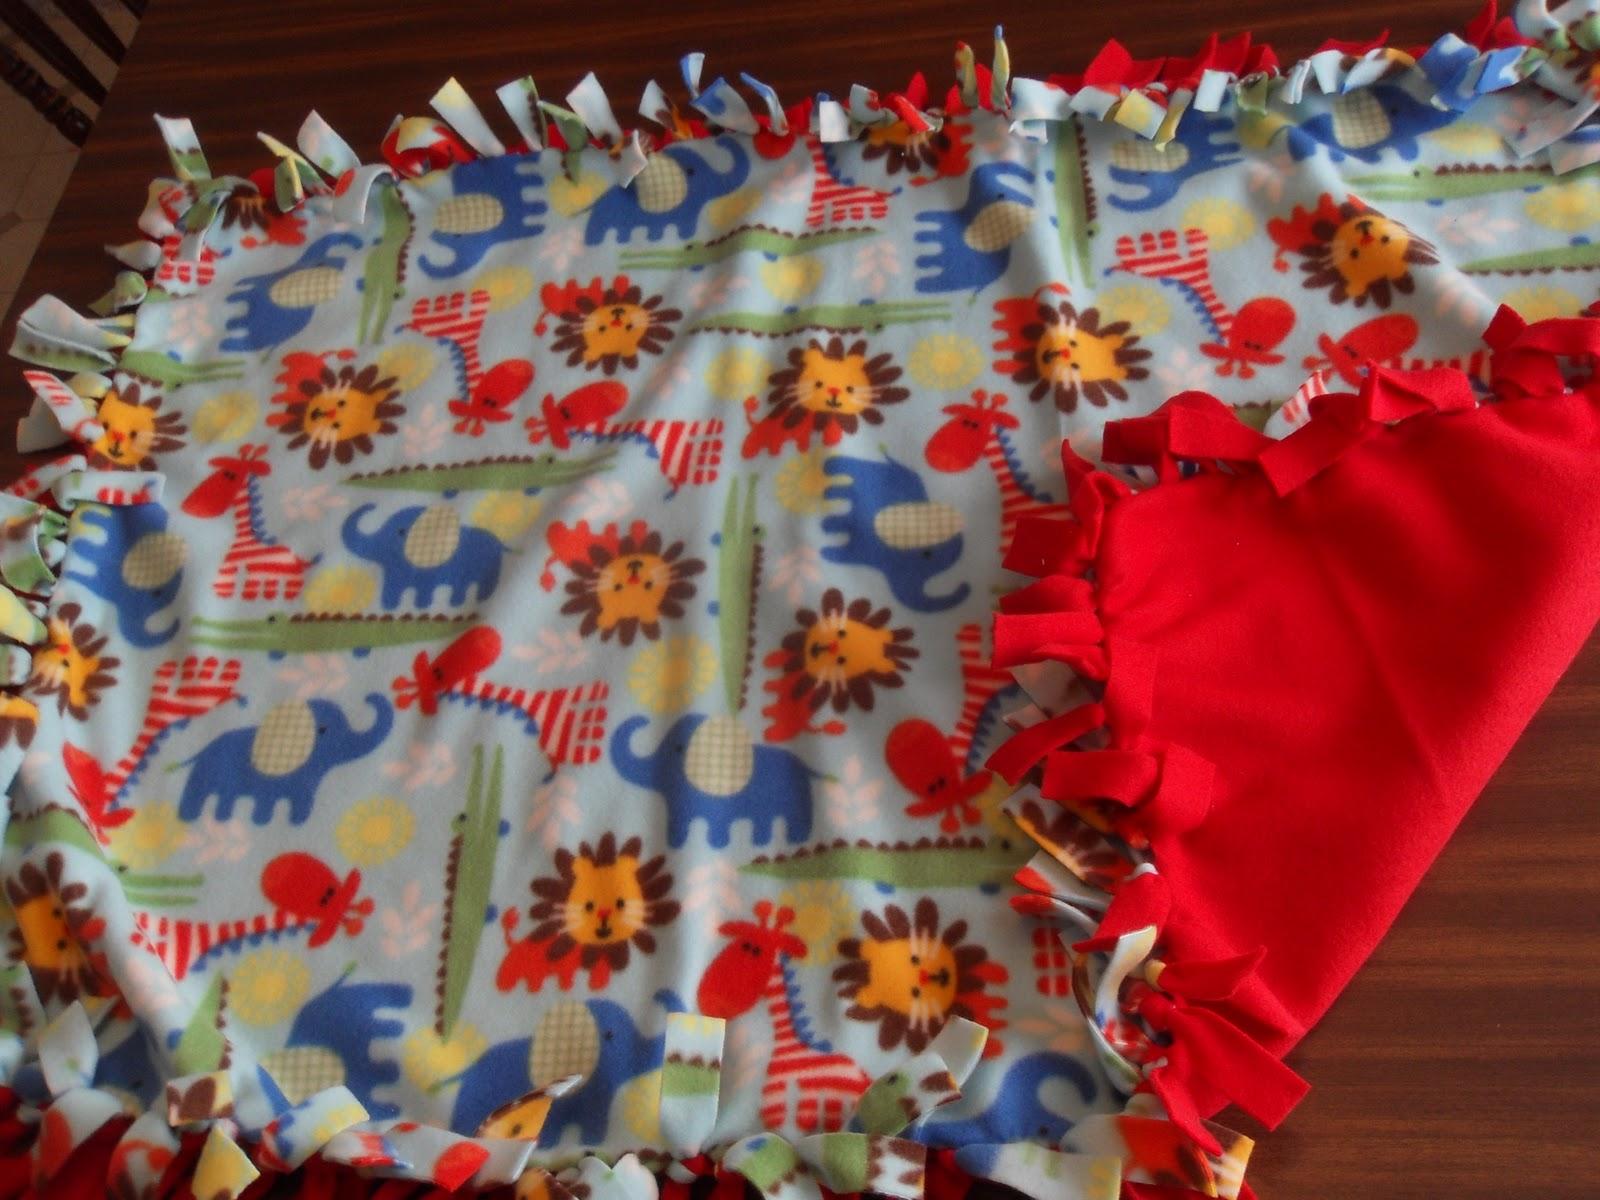 Simple joy crafting fleece tie blankets for charity fleece tie blankets for charity ccuart Images